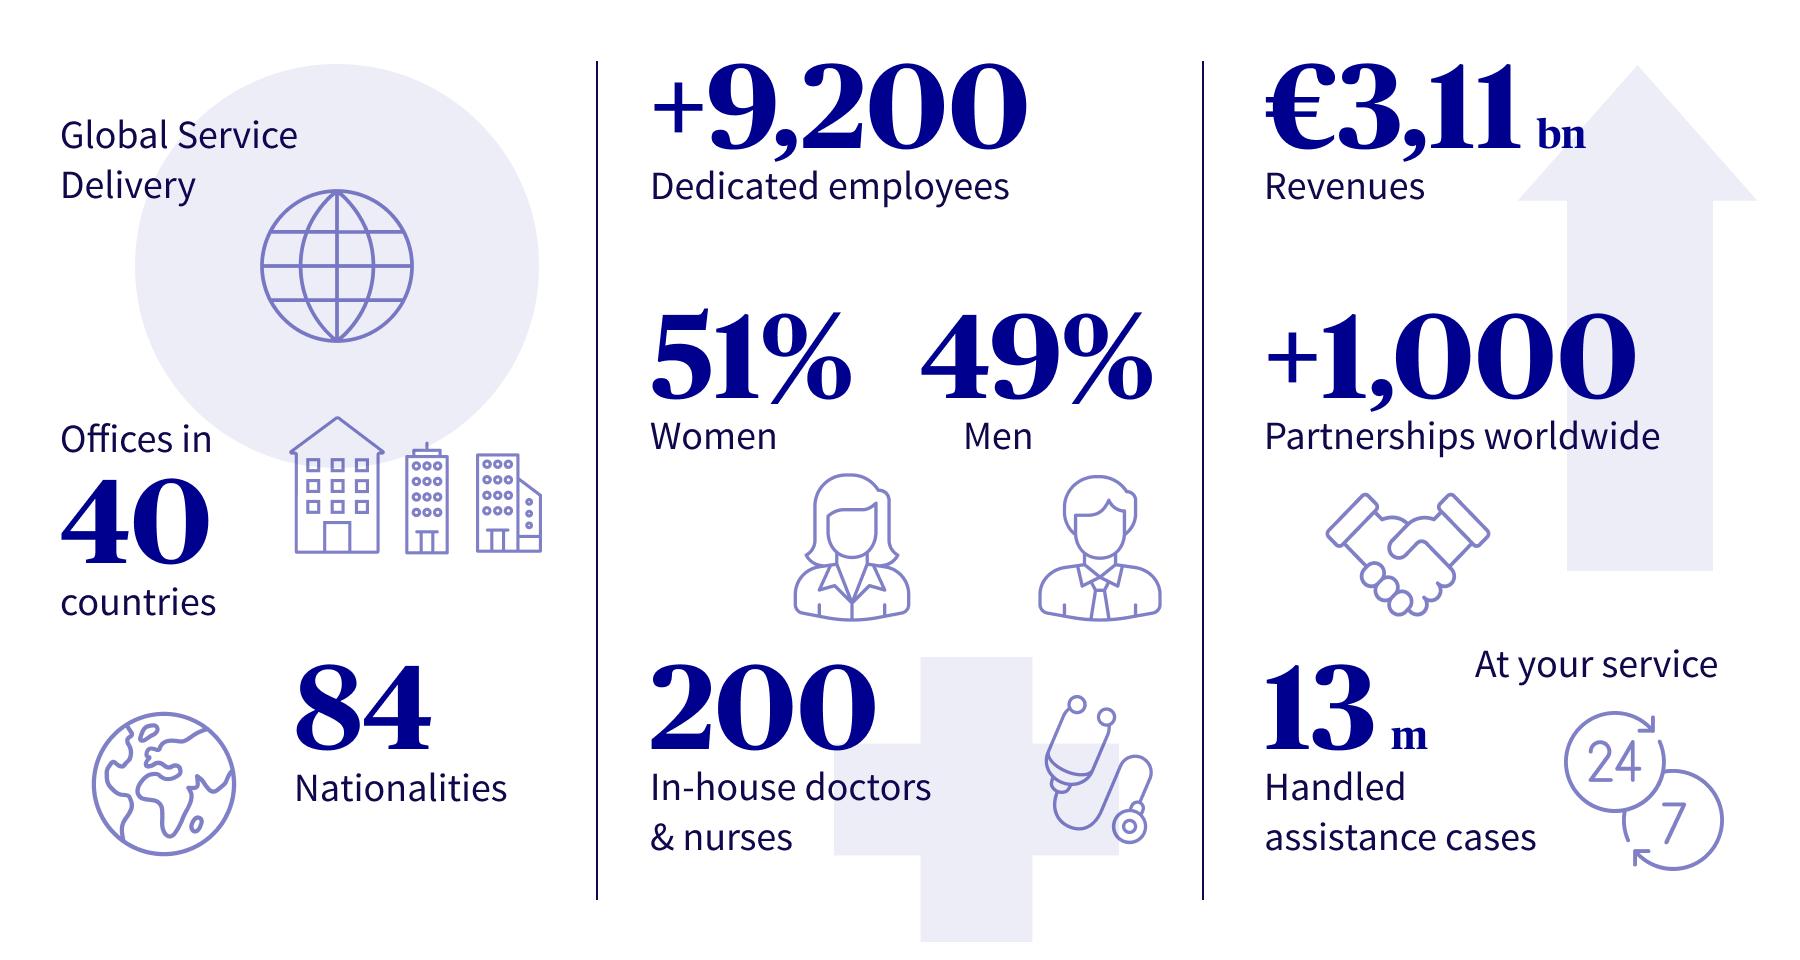 AXA Partners in numbers